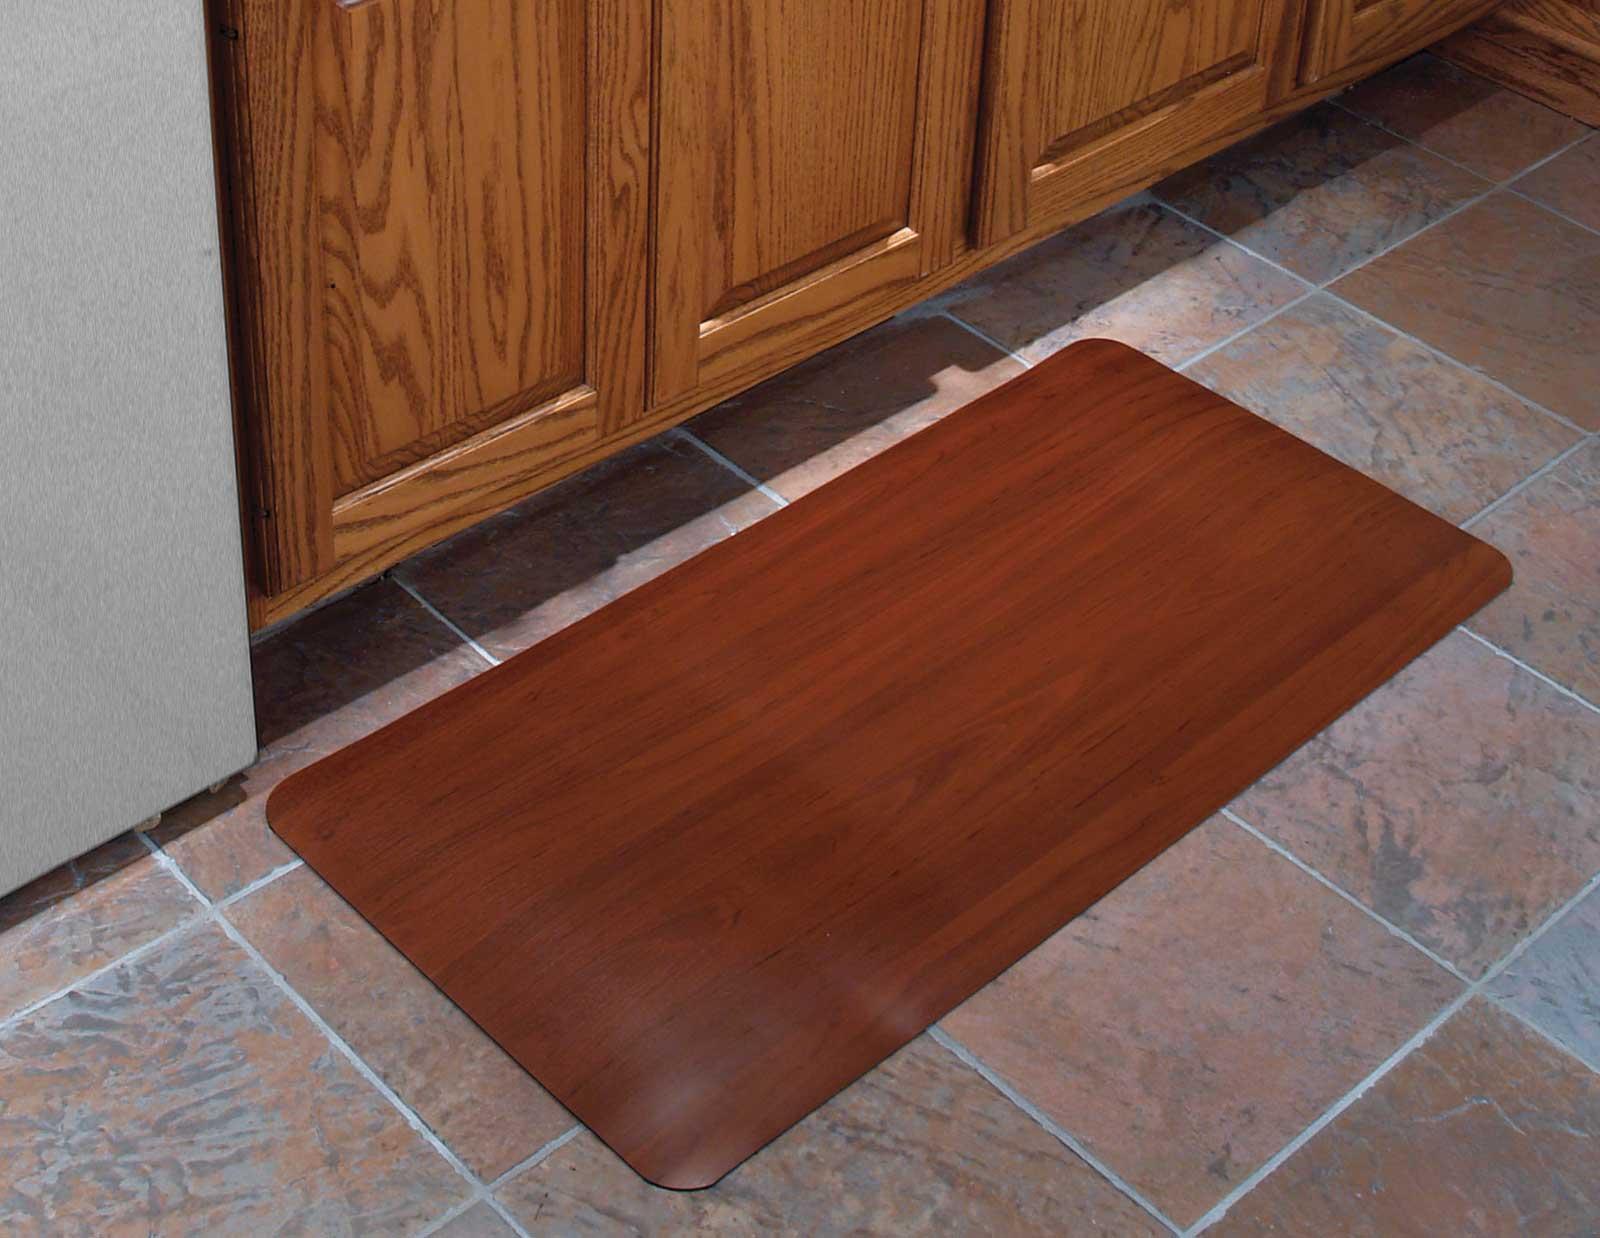 kitchen comfort floor mats banquette 24x36 inch cushioned mat - wood grain in